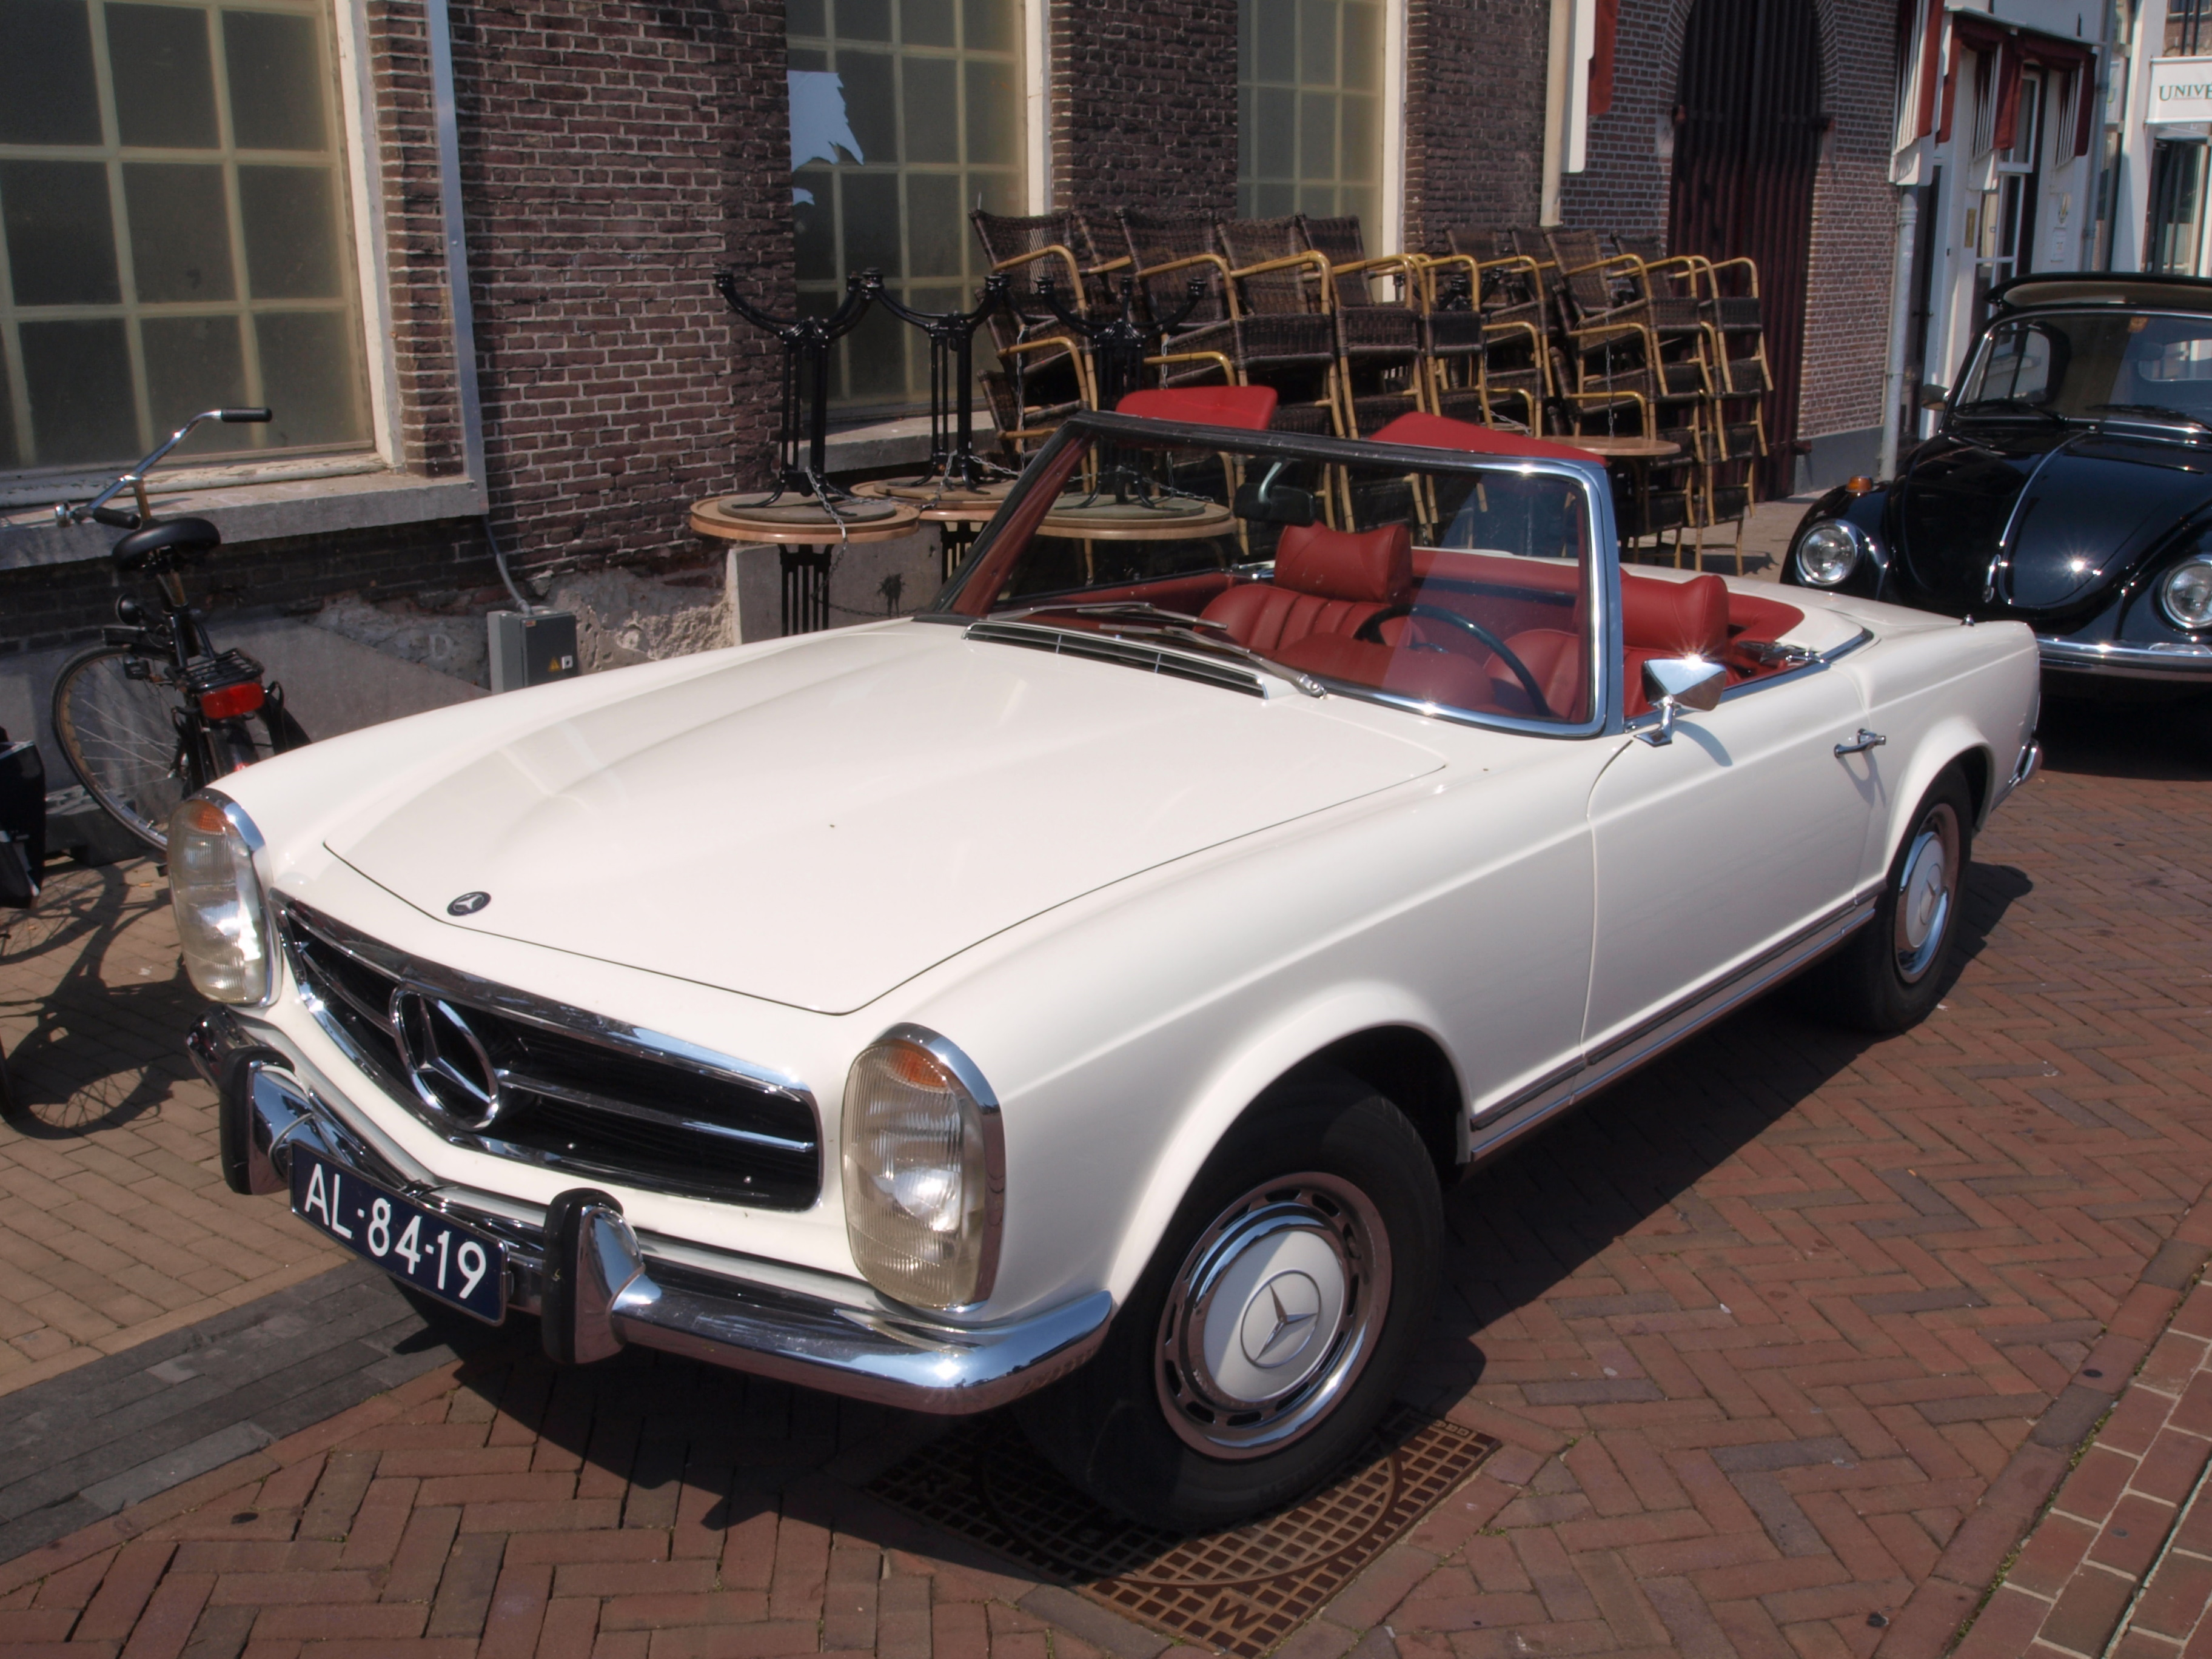 File 1969 mercedes benz 280sl automatic al 84 19 jpg for Mercedes benz alabama